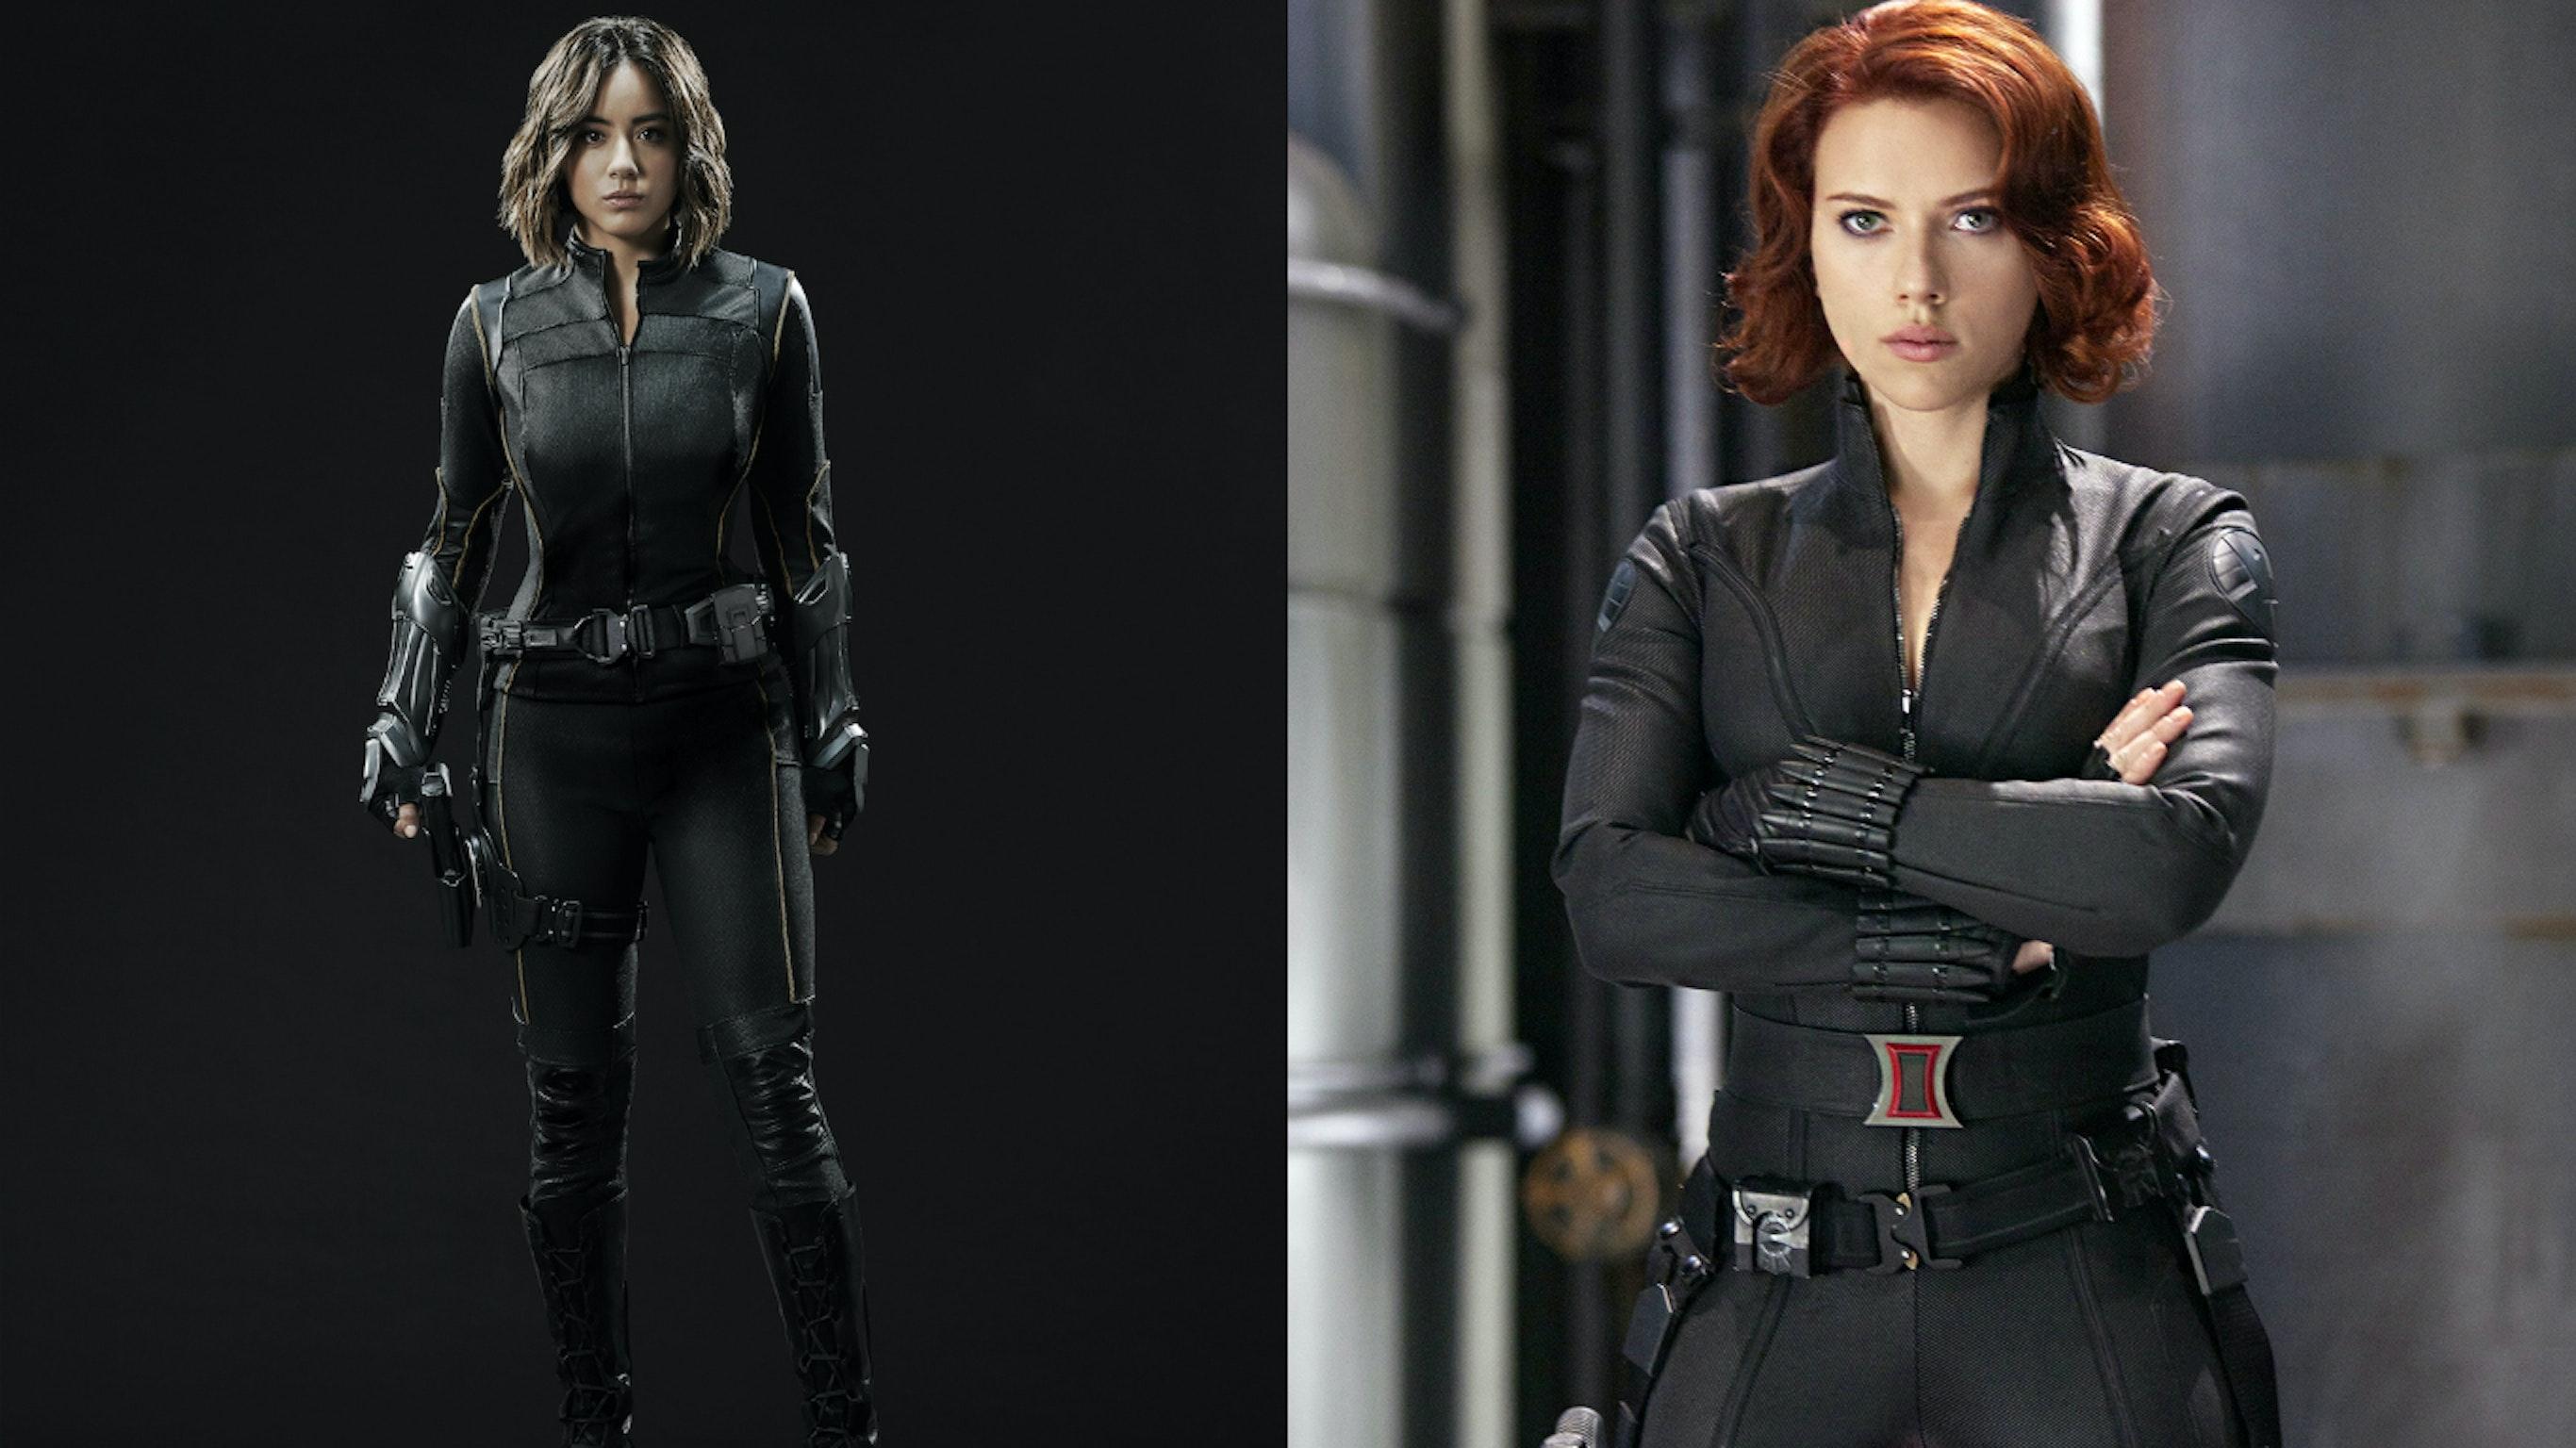 Daisy Black Widow costume Agents of SHIELD Avengers